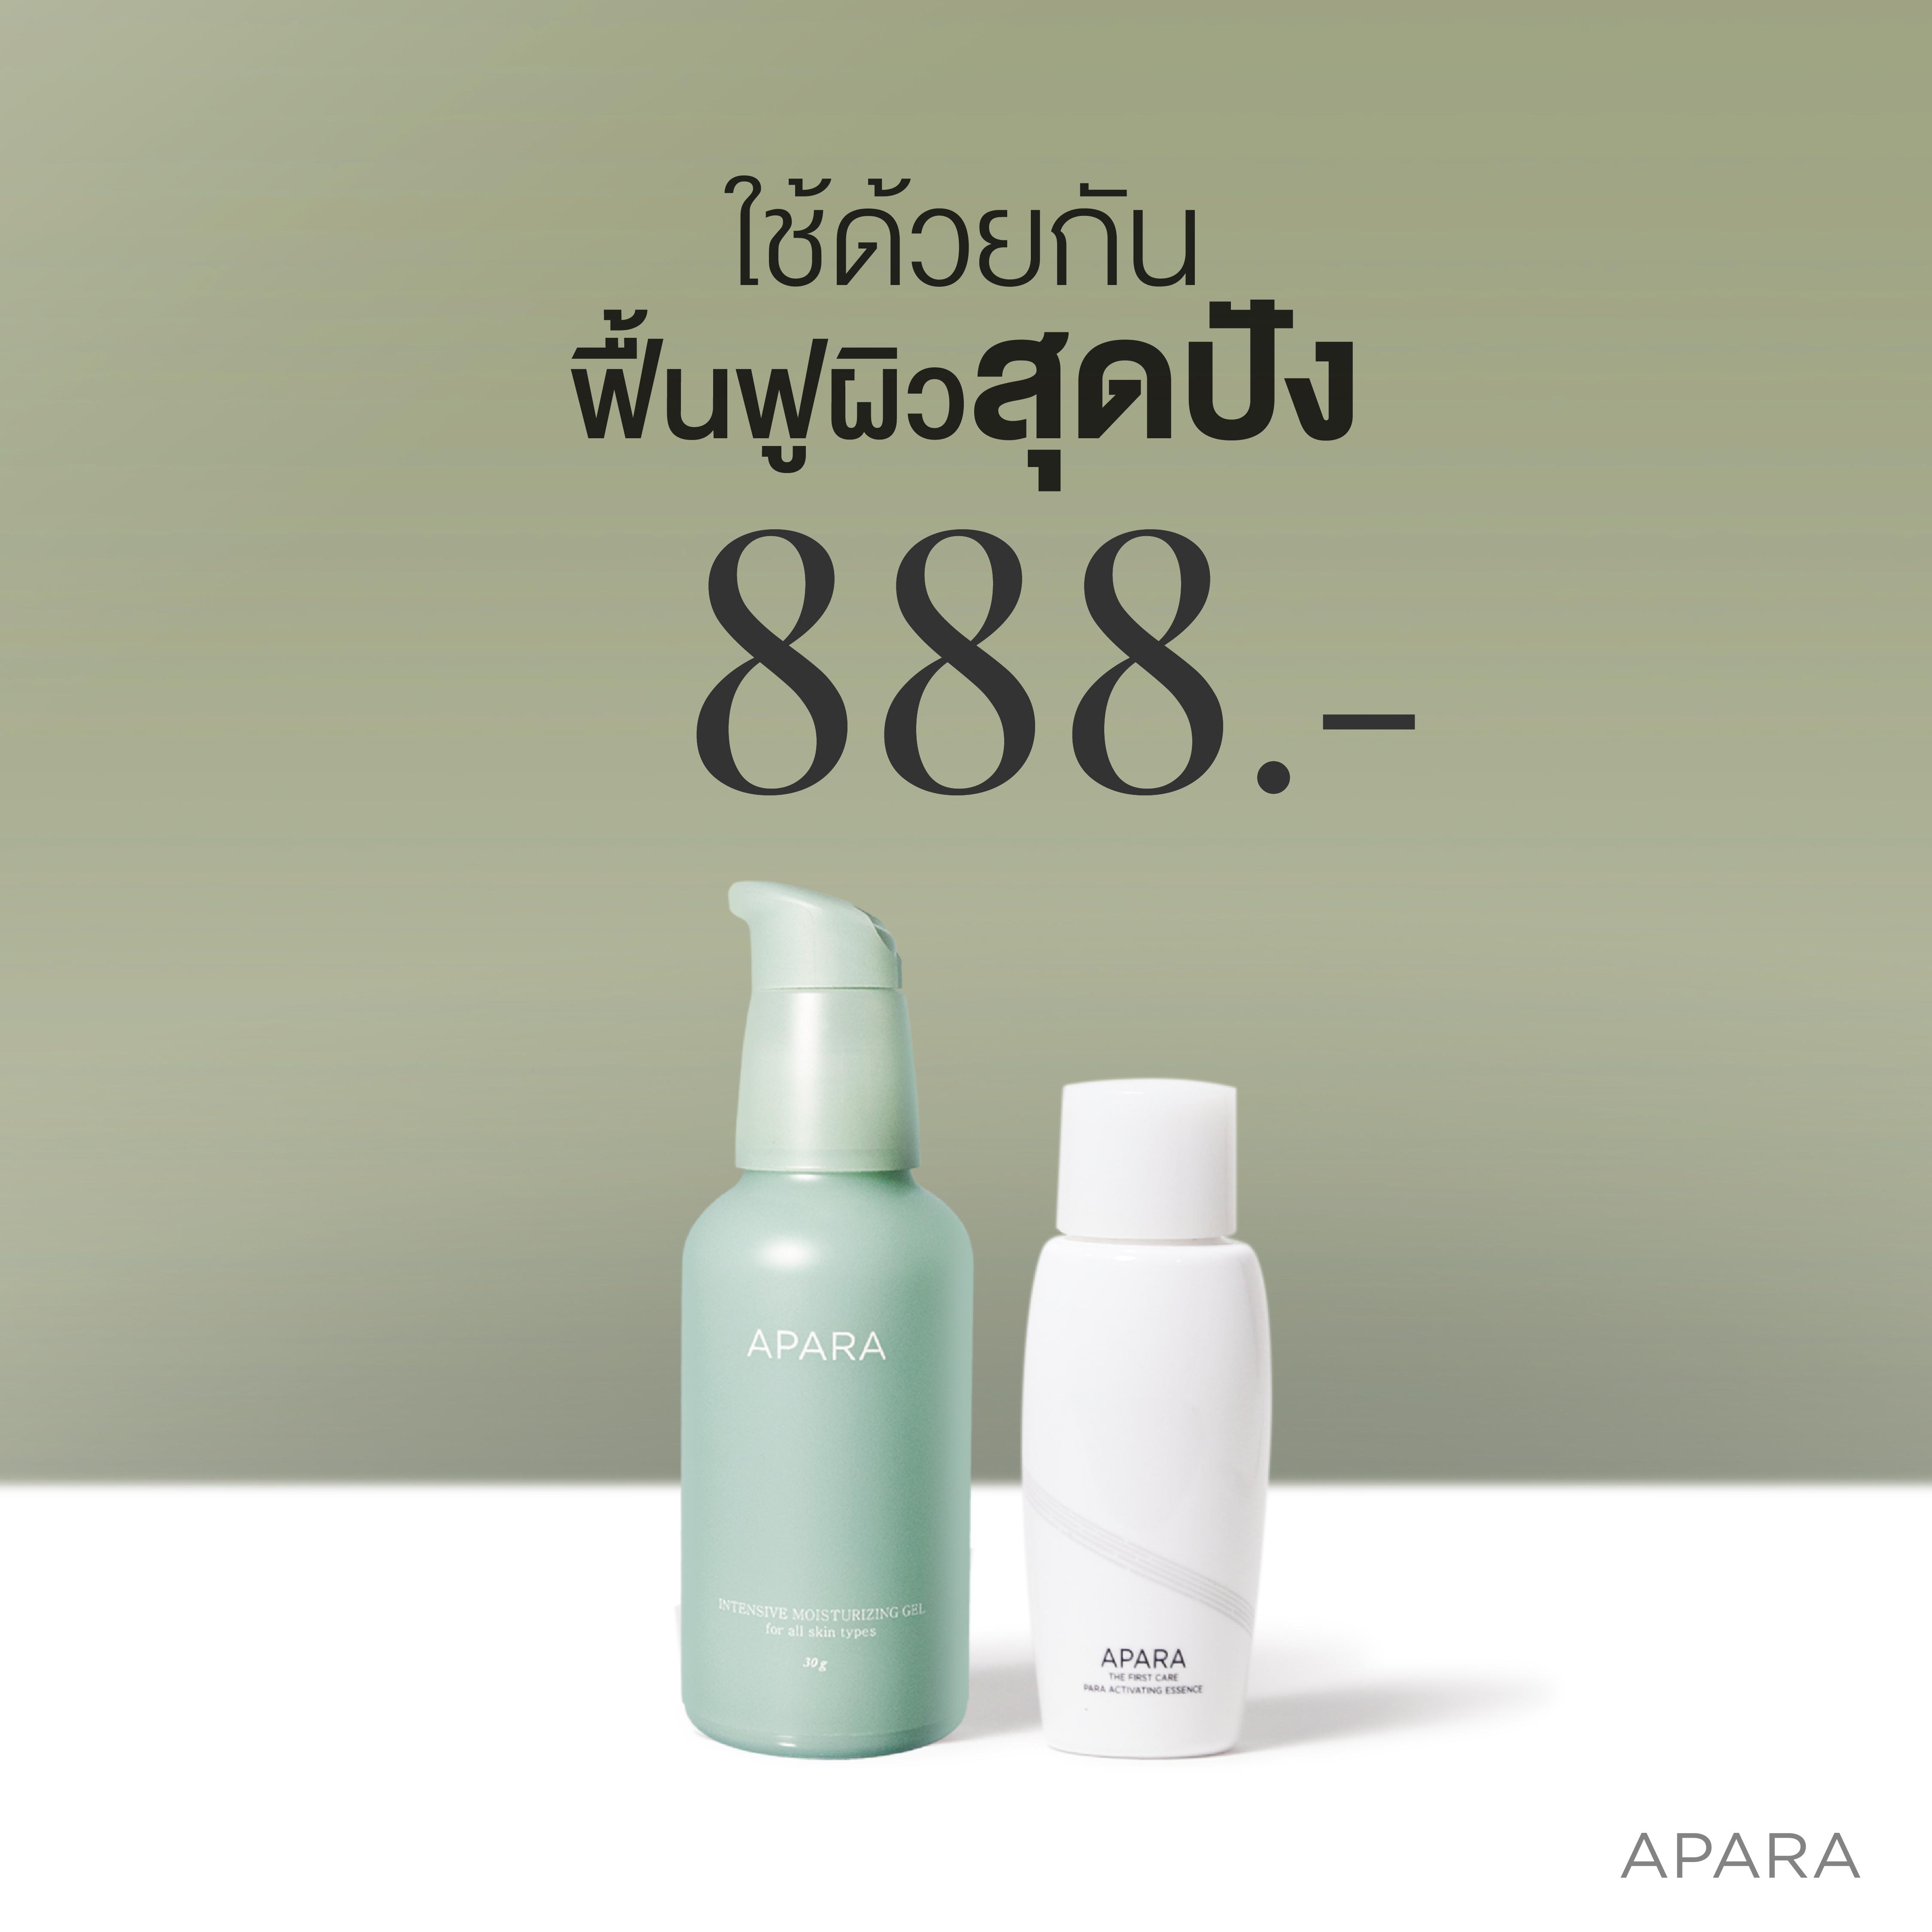 APARA ESSENCE 30 ml. + Intensive Moisturizing Gel 30. ml.